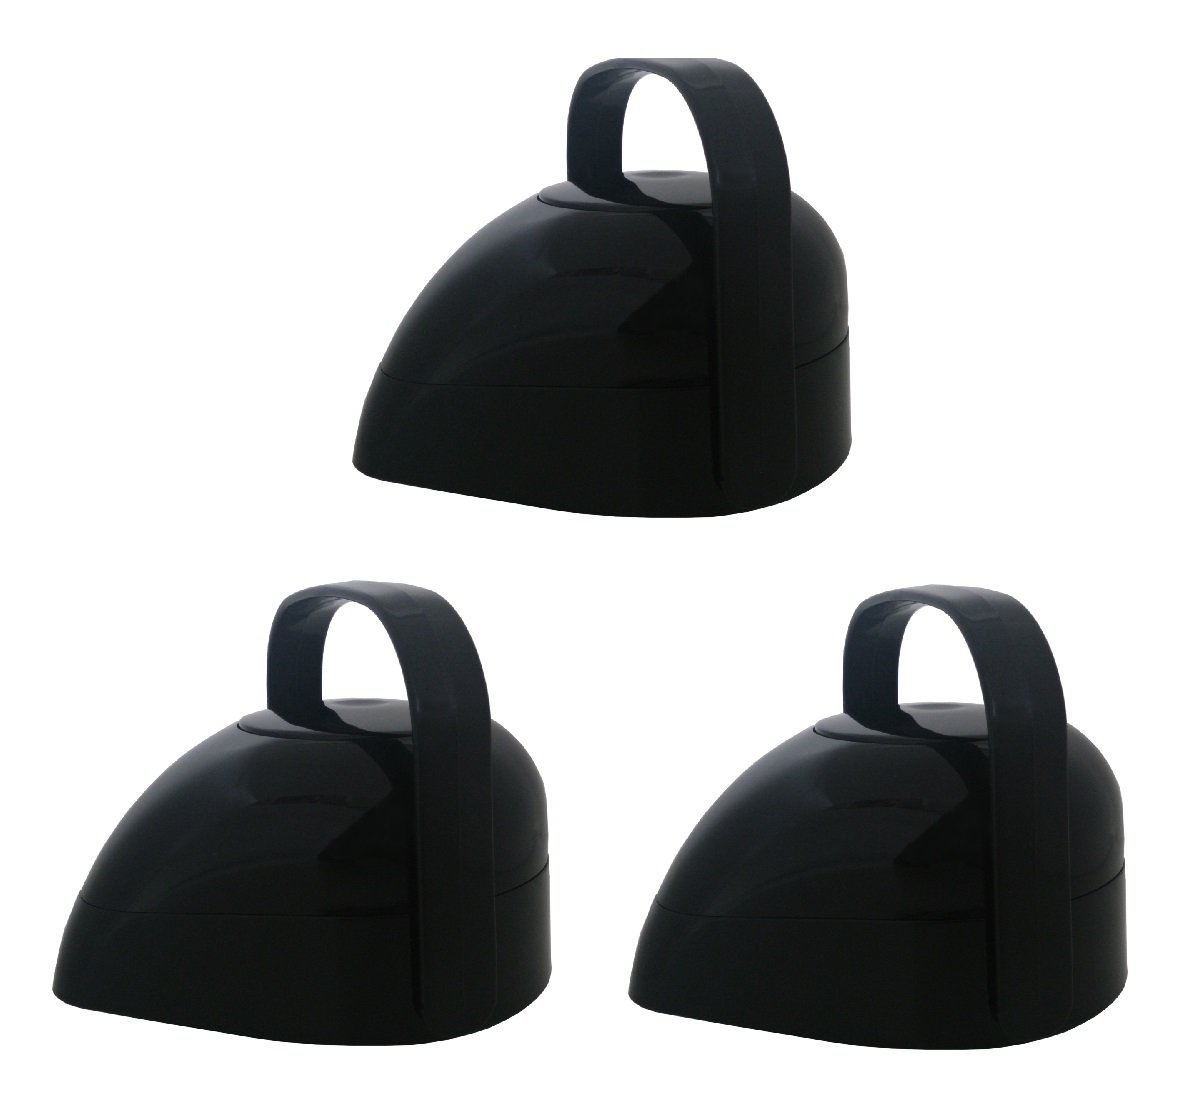 Kit 3 Bombas de Pressão para Garrafa Térmica R-Evolution 1.9L Termolar